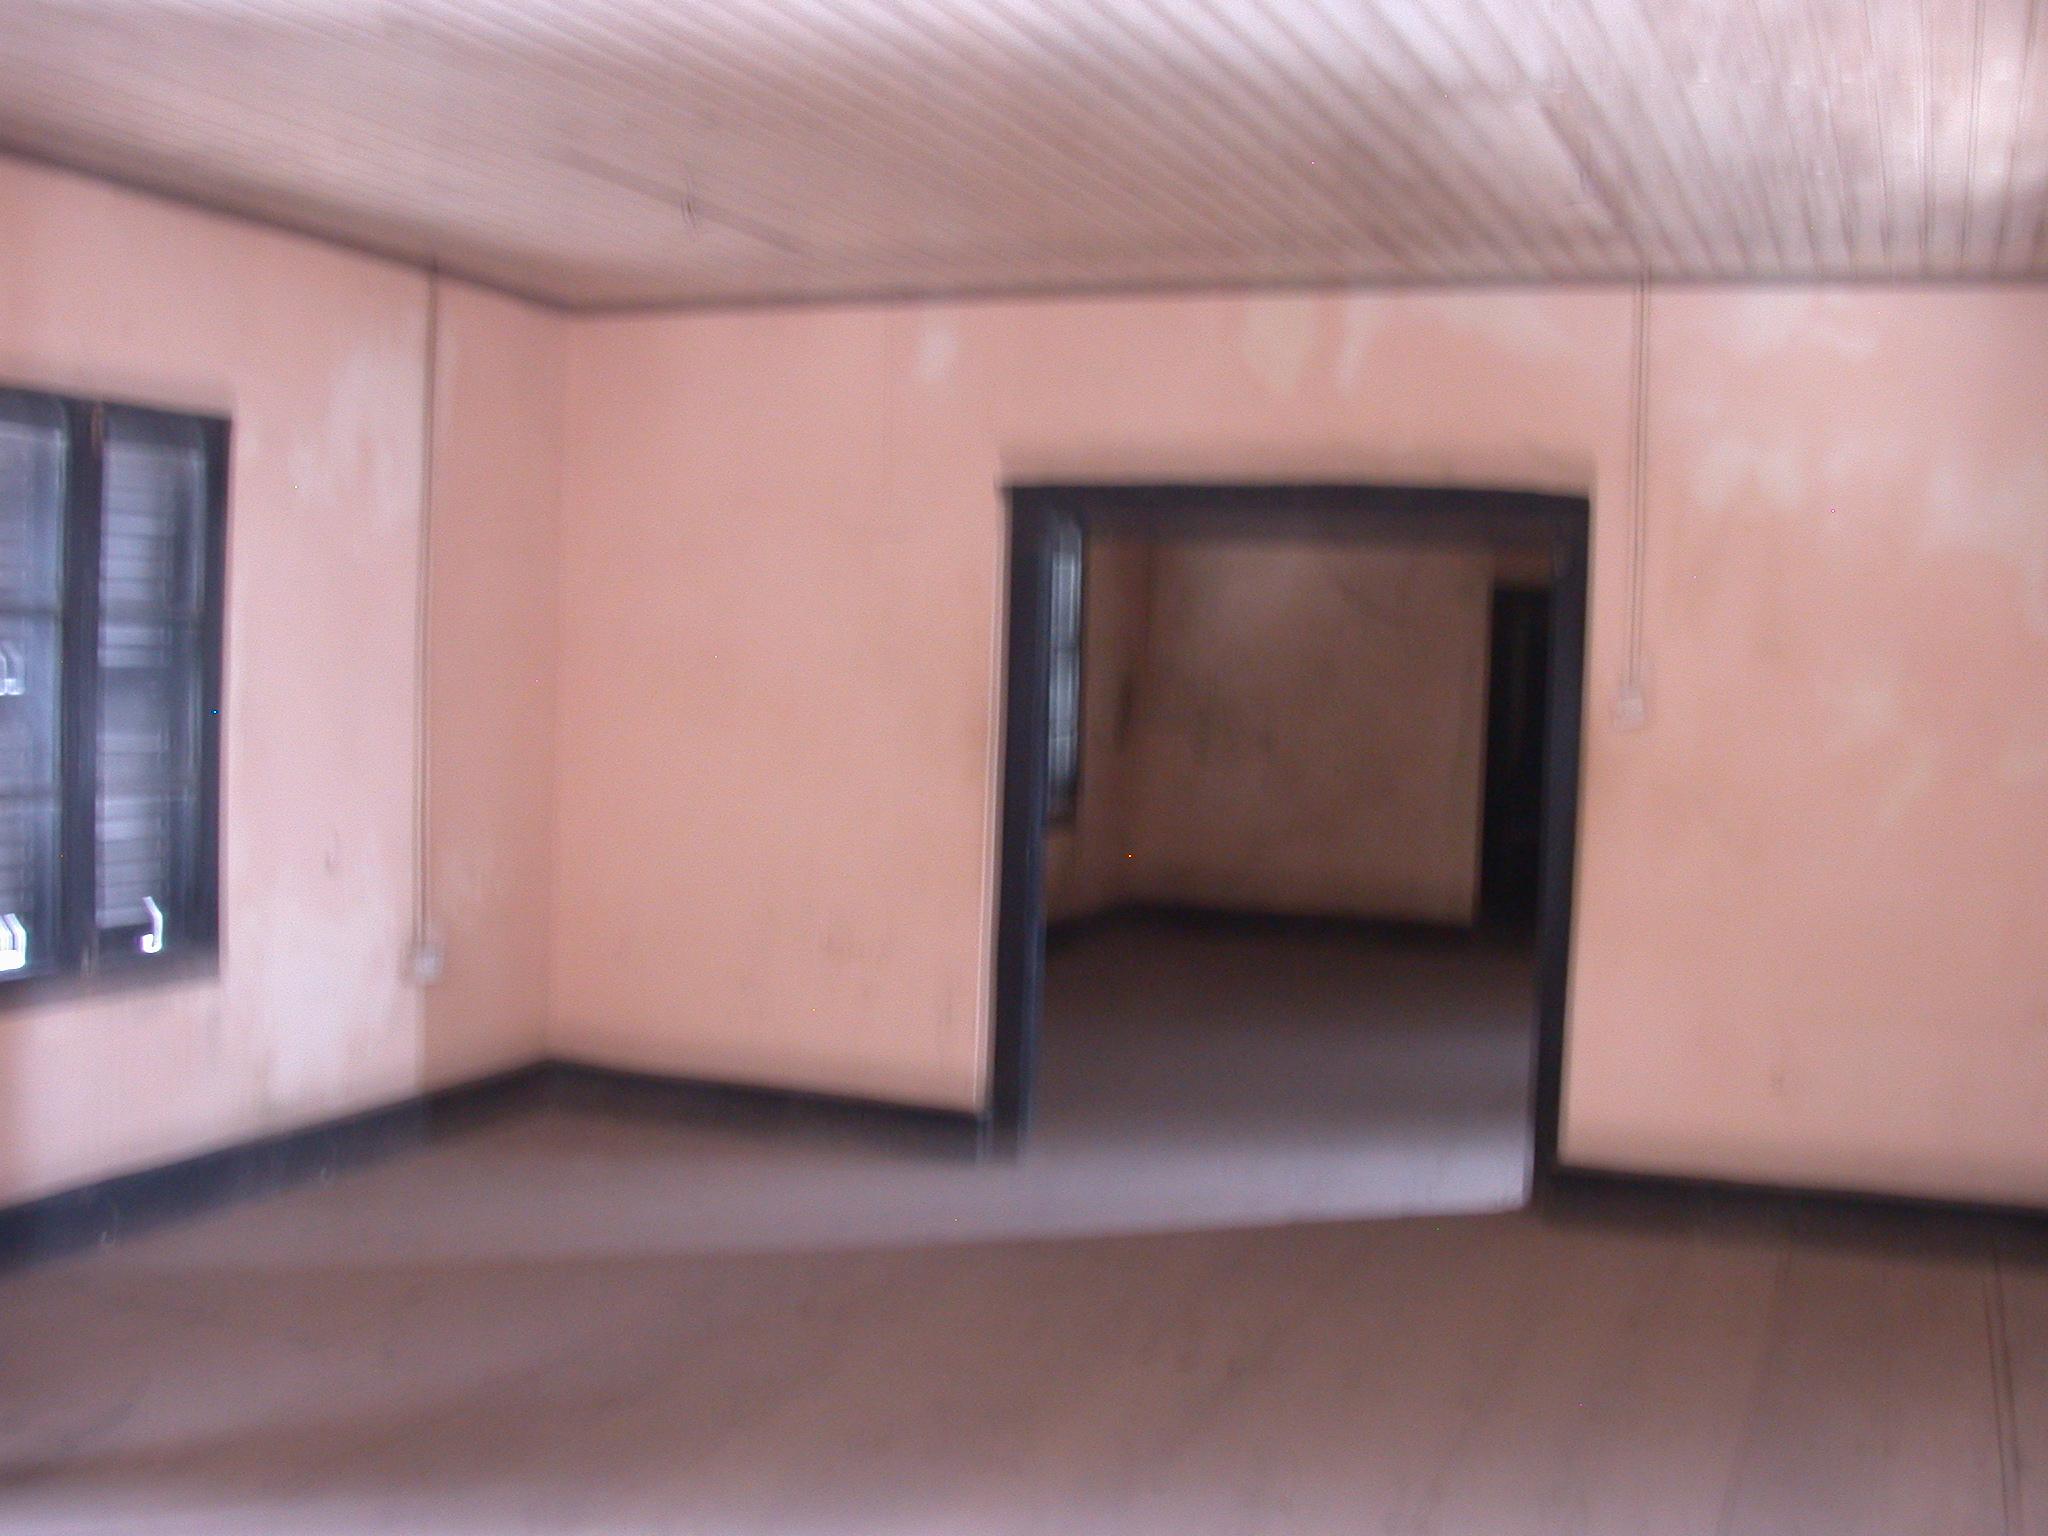 Governors Chambers, Elmina Slave Fort, Elmina, Ghana